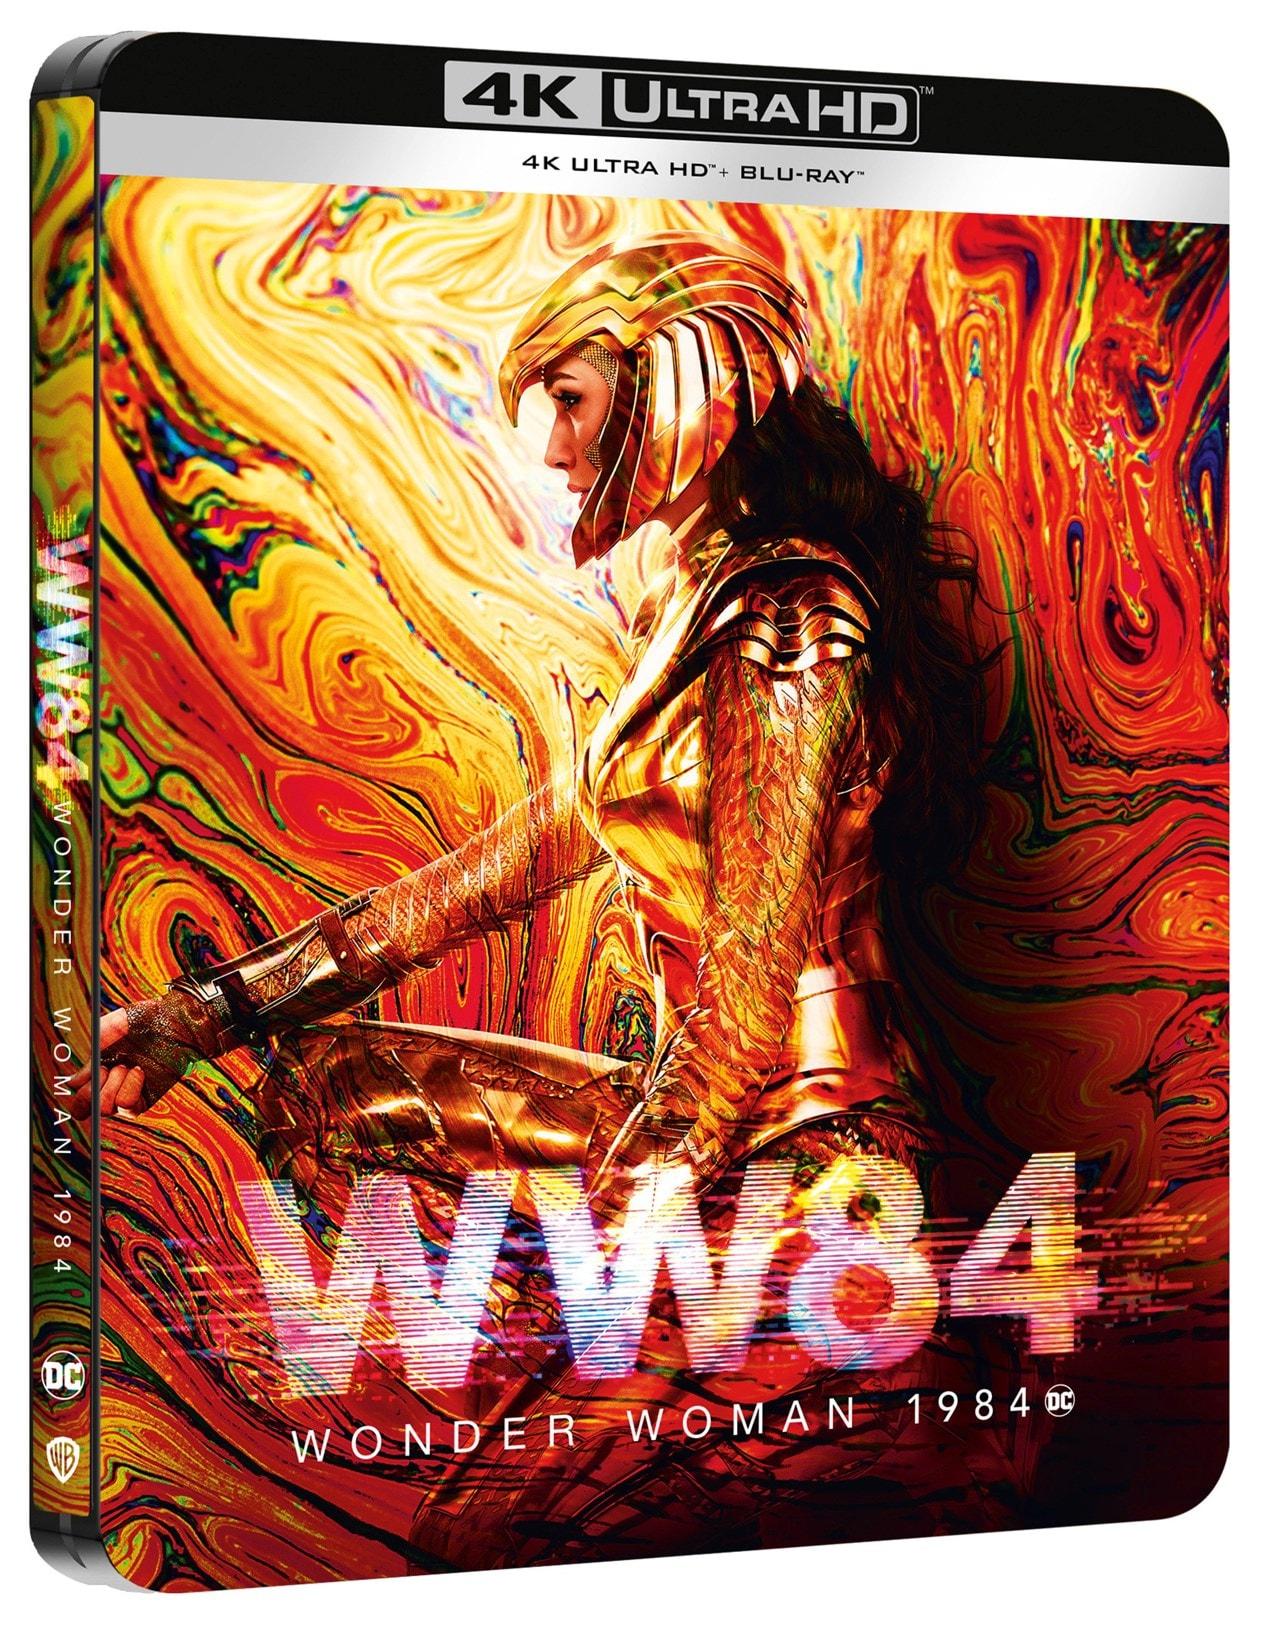 Wonder Woman 1984 (hmv Exclusive) 4K Ultra HD Steelbook - 2